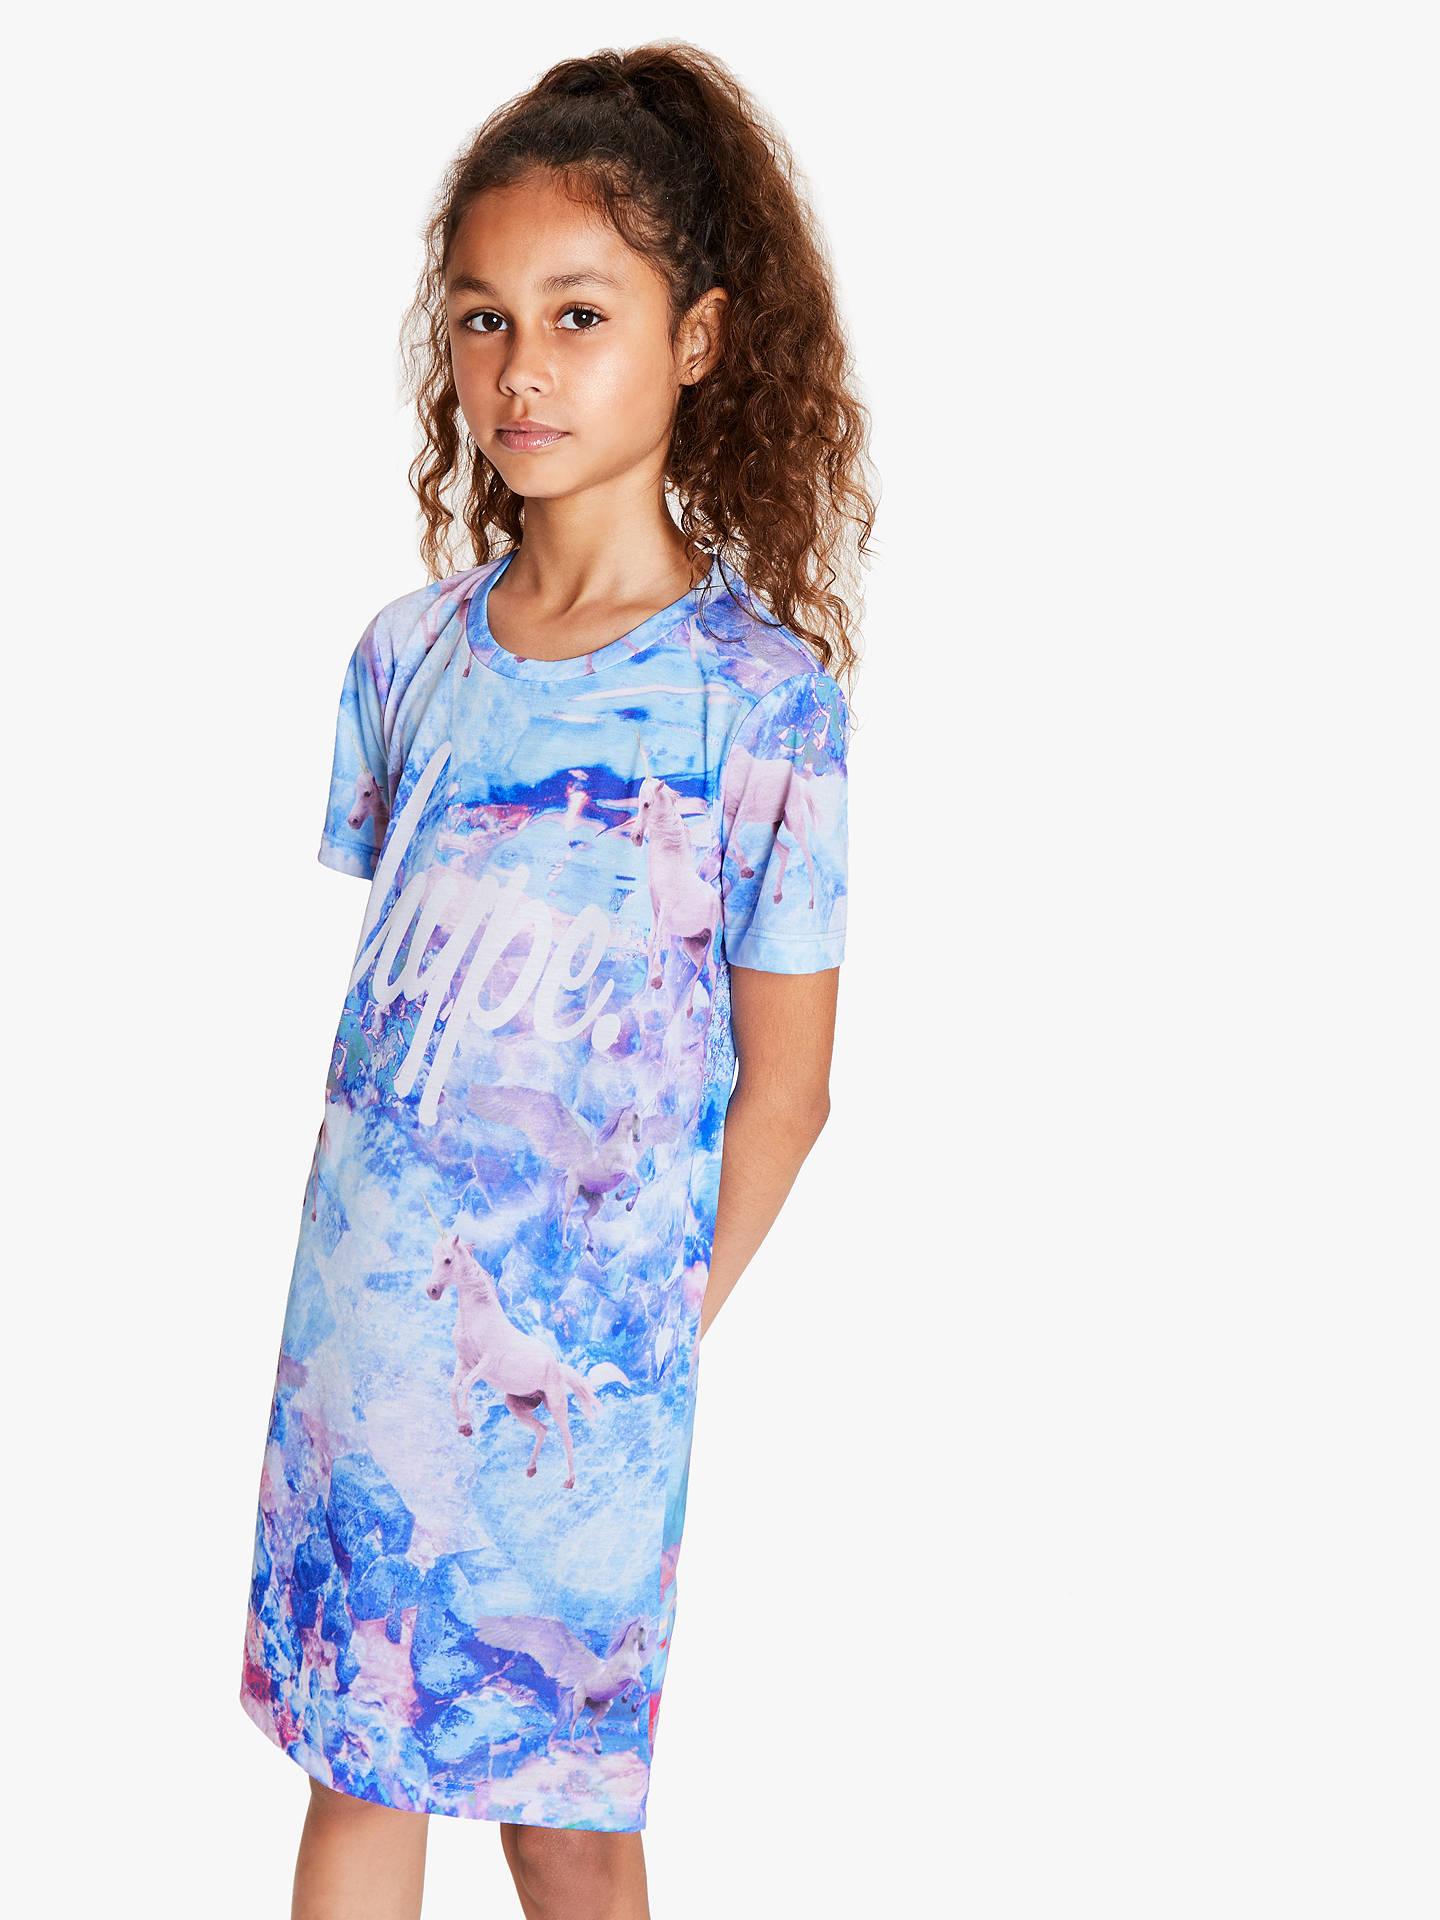 f9dafd7880 Buy Hype Girls  Unicorn Dream T-Shirt Dress